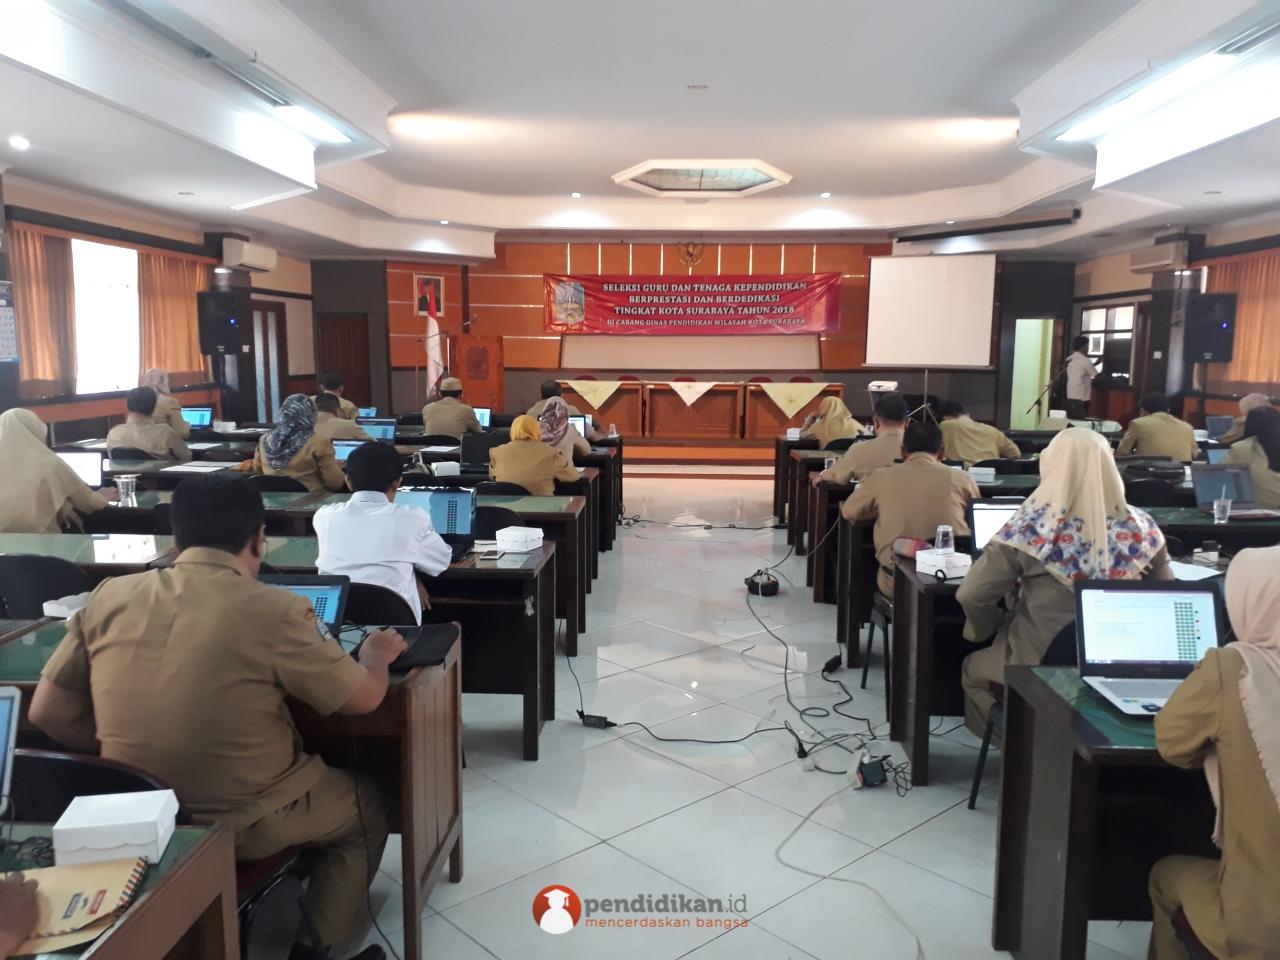 Ujian Seleksi Guru SMA/SMK Prestasi Se-Kota 2018 oleh Dinas Pendidikan Kota Surabaya Bersama Pendidikan.id